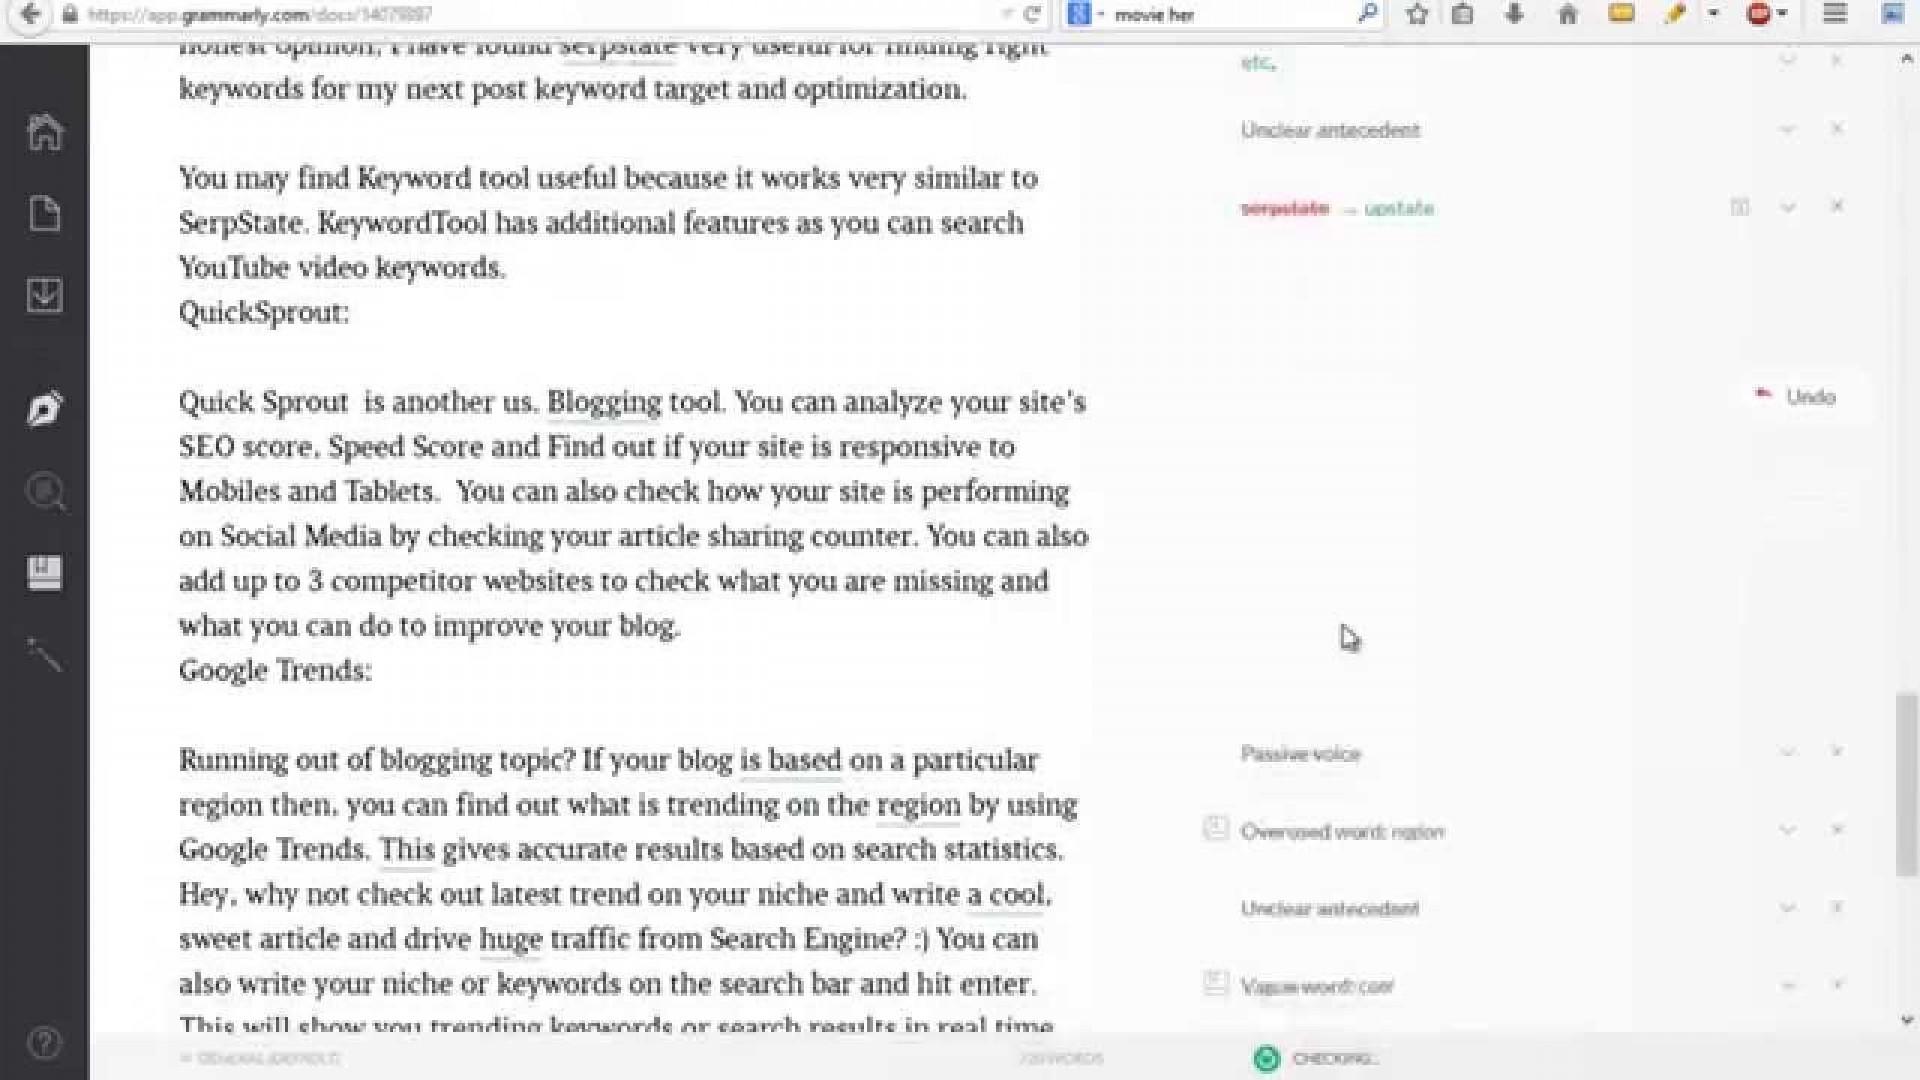 002 Maxresdefault Essay Example Checker Free Amazing Online Sentence Grammar Plagiarism Document 1920